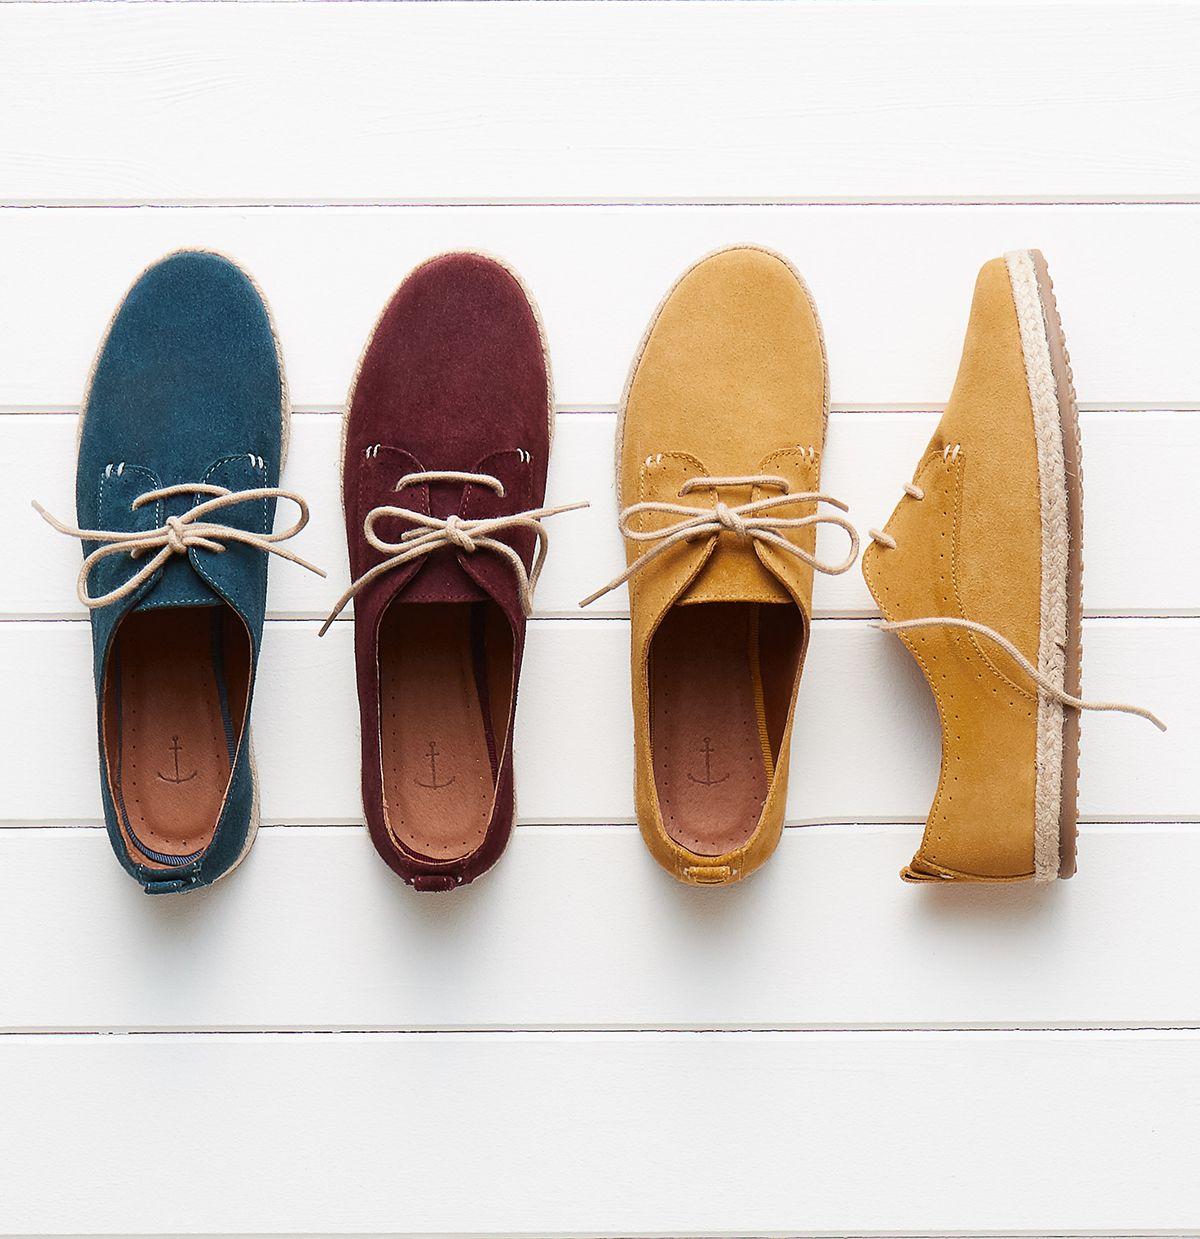 Suede Shoes by Seasalt Cornwall   Suede